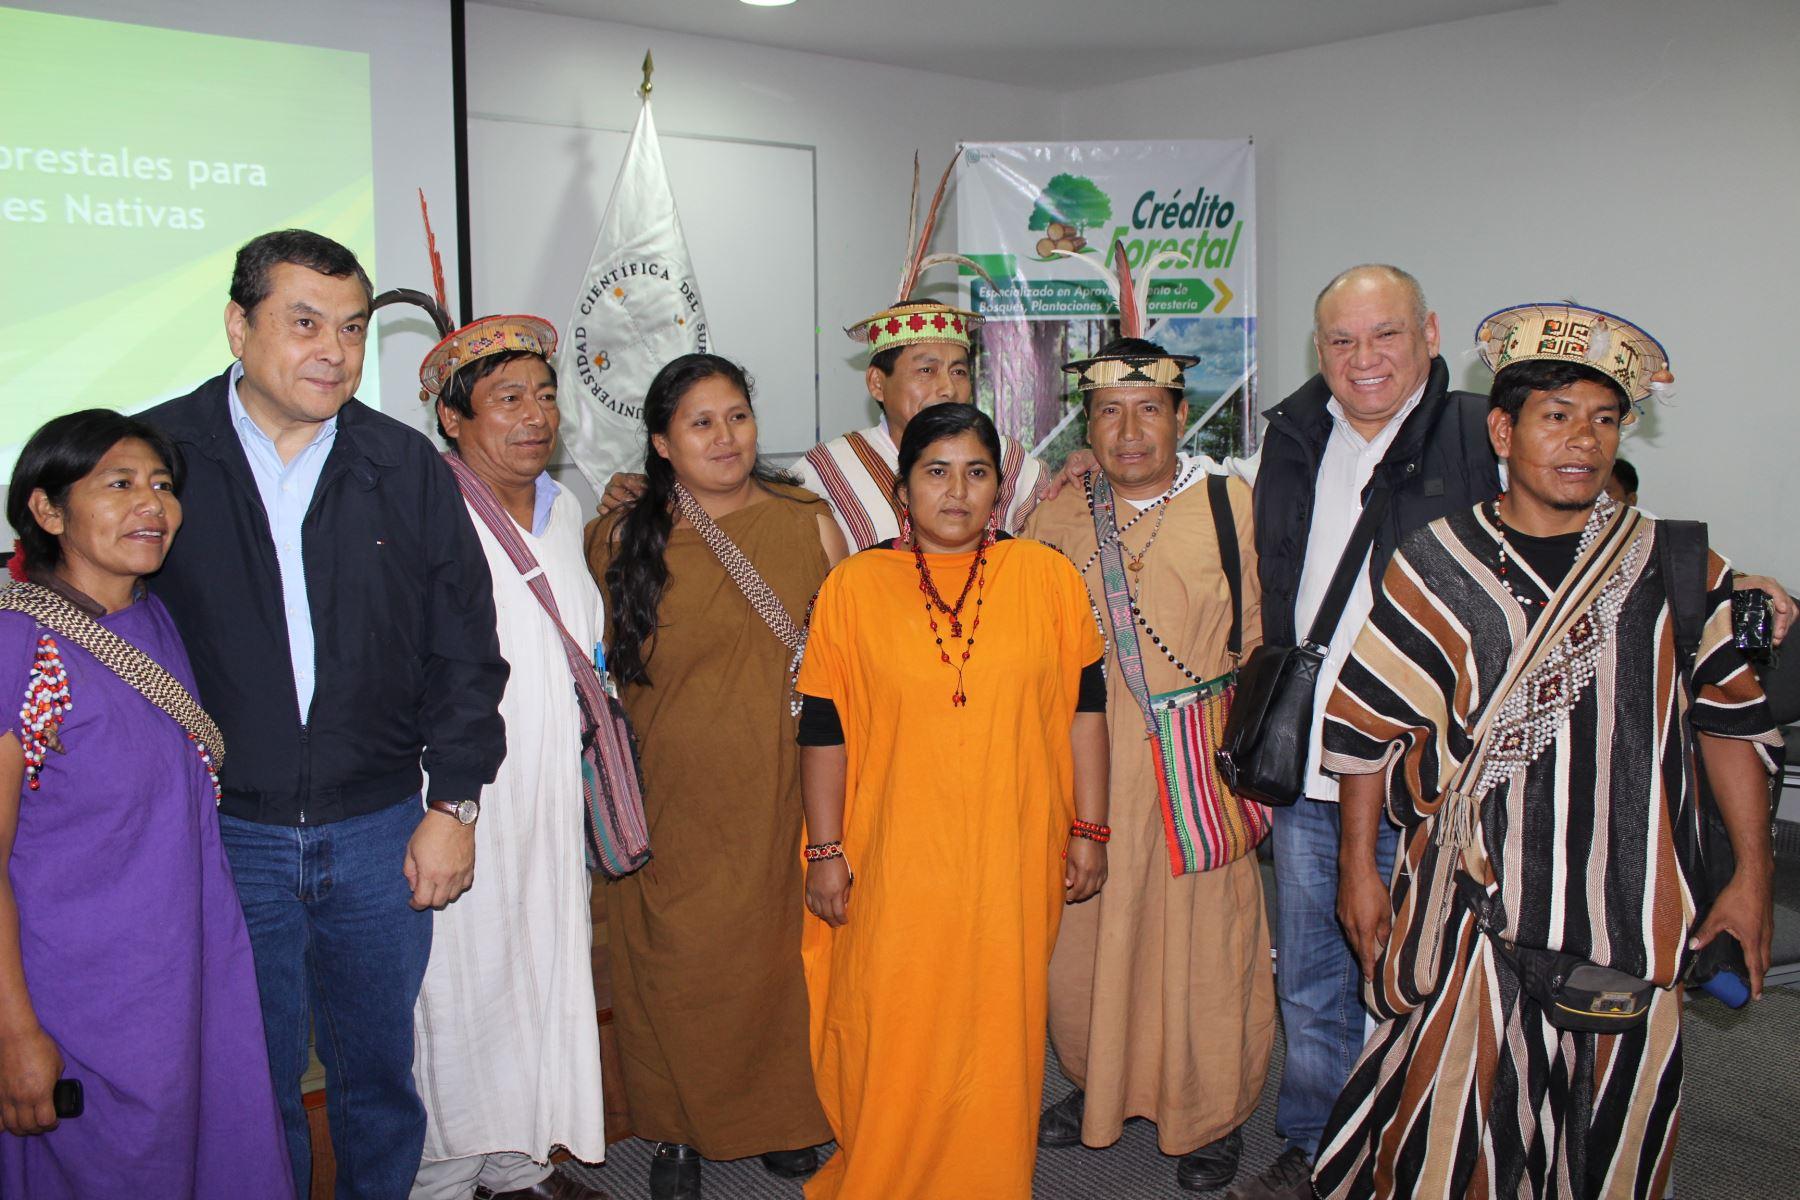 Agrobanco promueve alianzas para reforestación en comunidades nativas. Foto: Difusión.